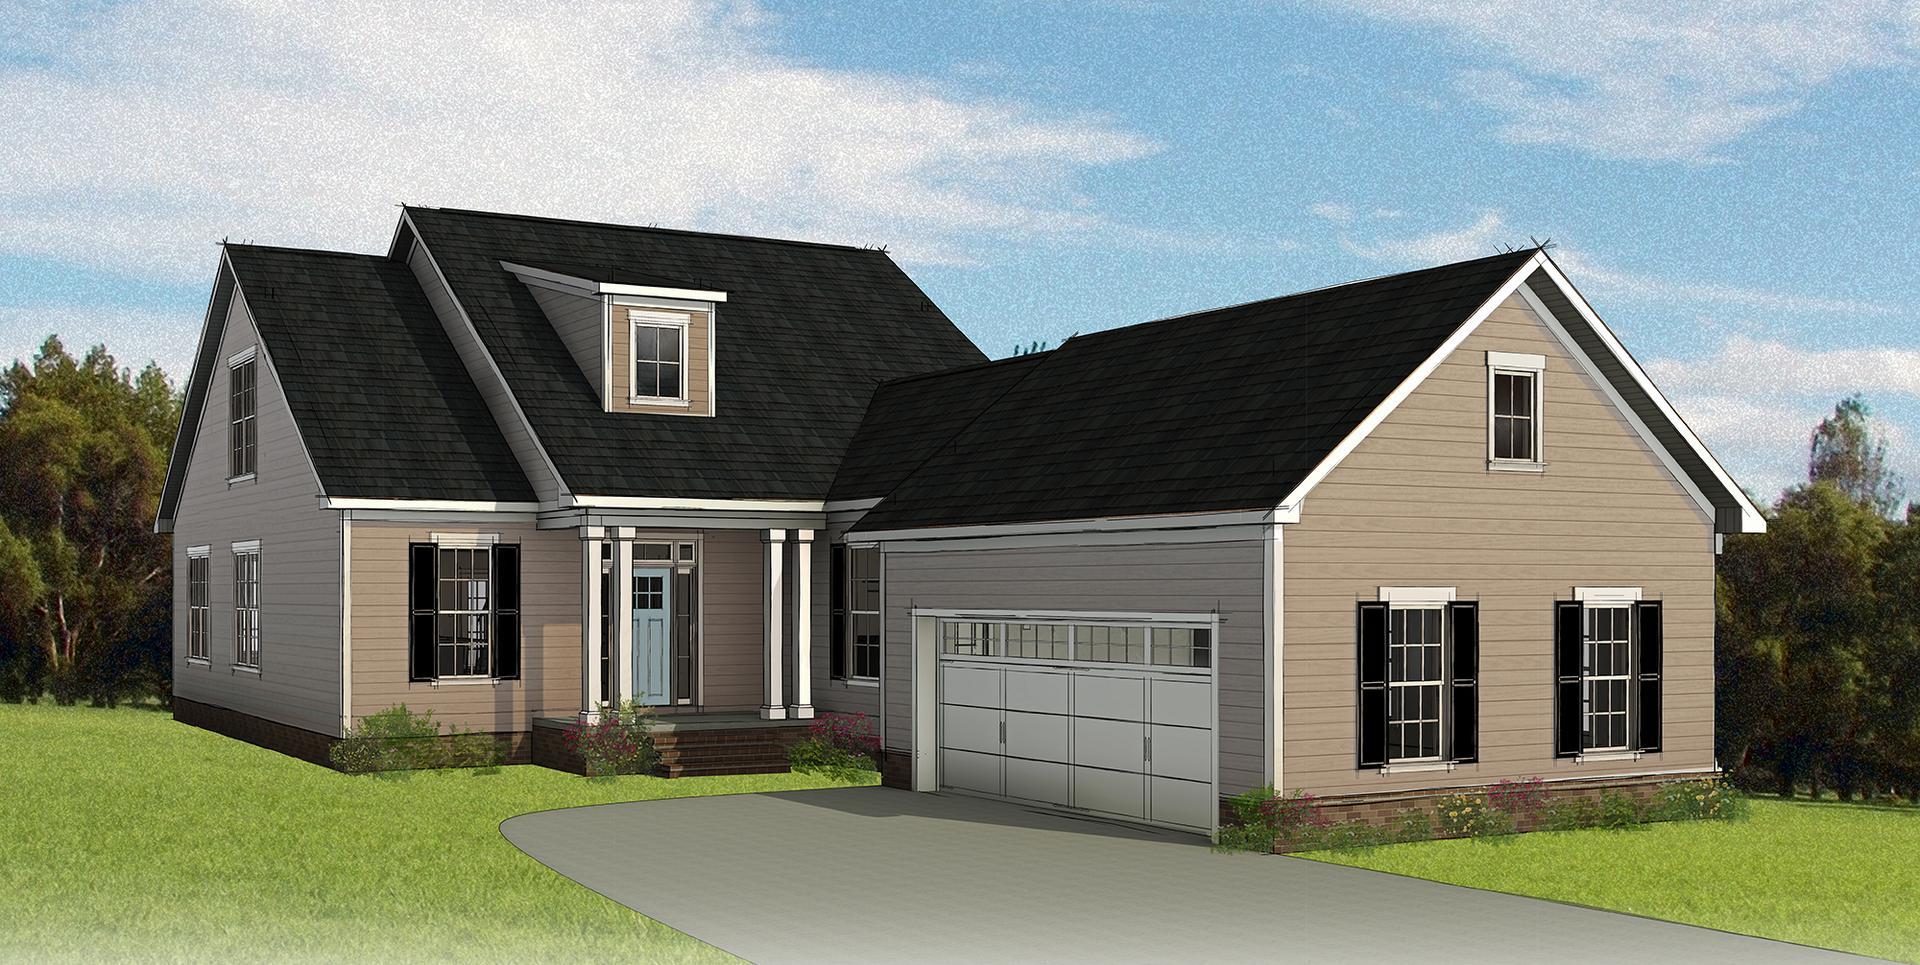 The Acton new home in Smithfield VA